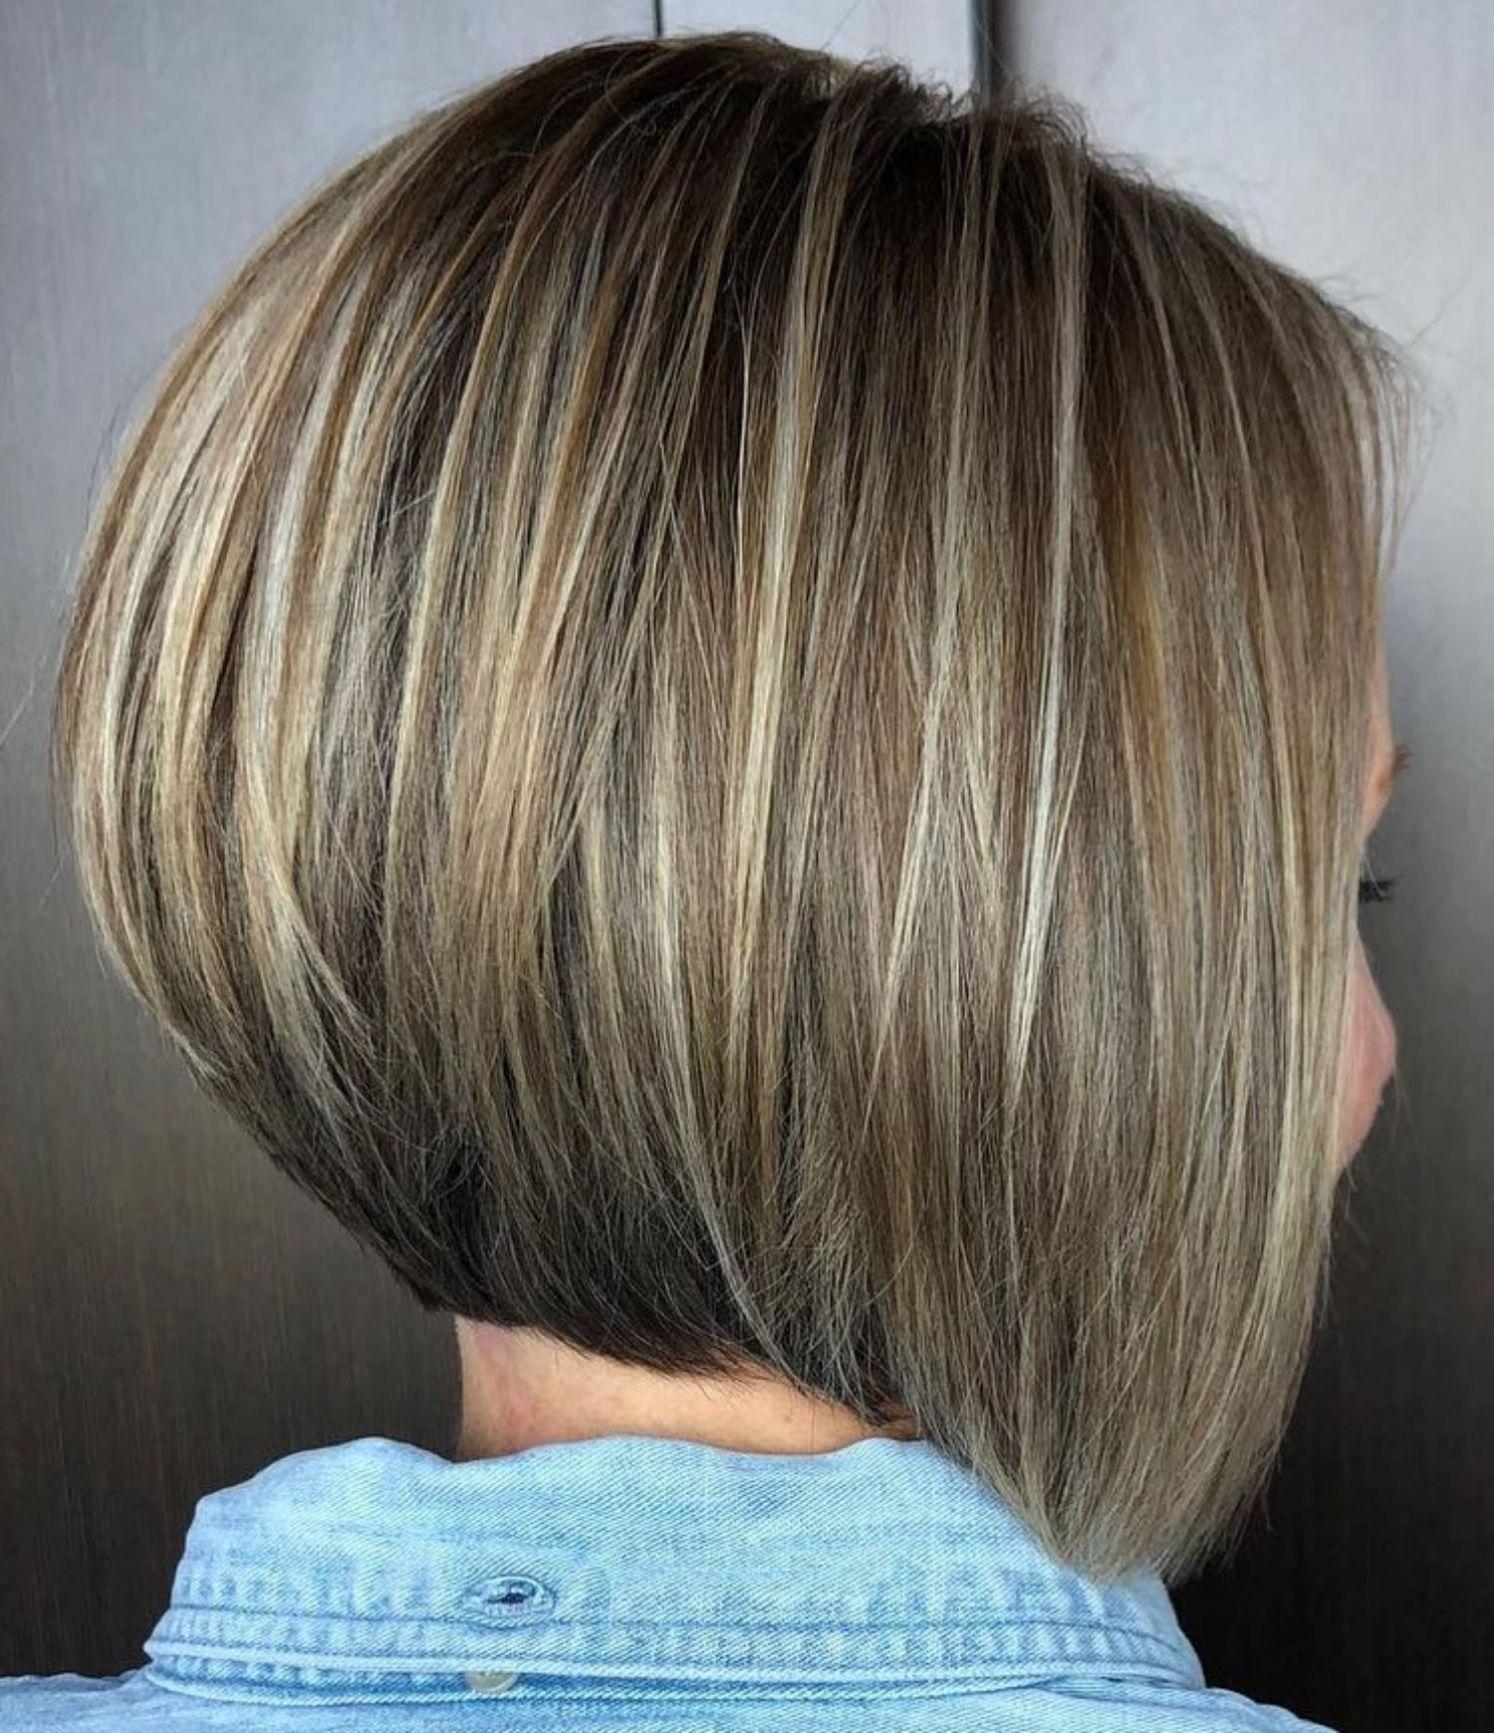 47+ Slanted bob hairstyles ideas